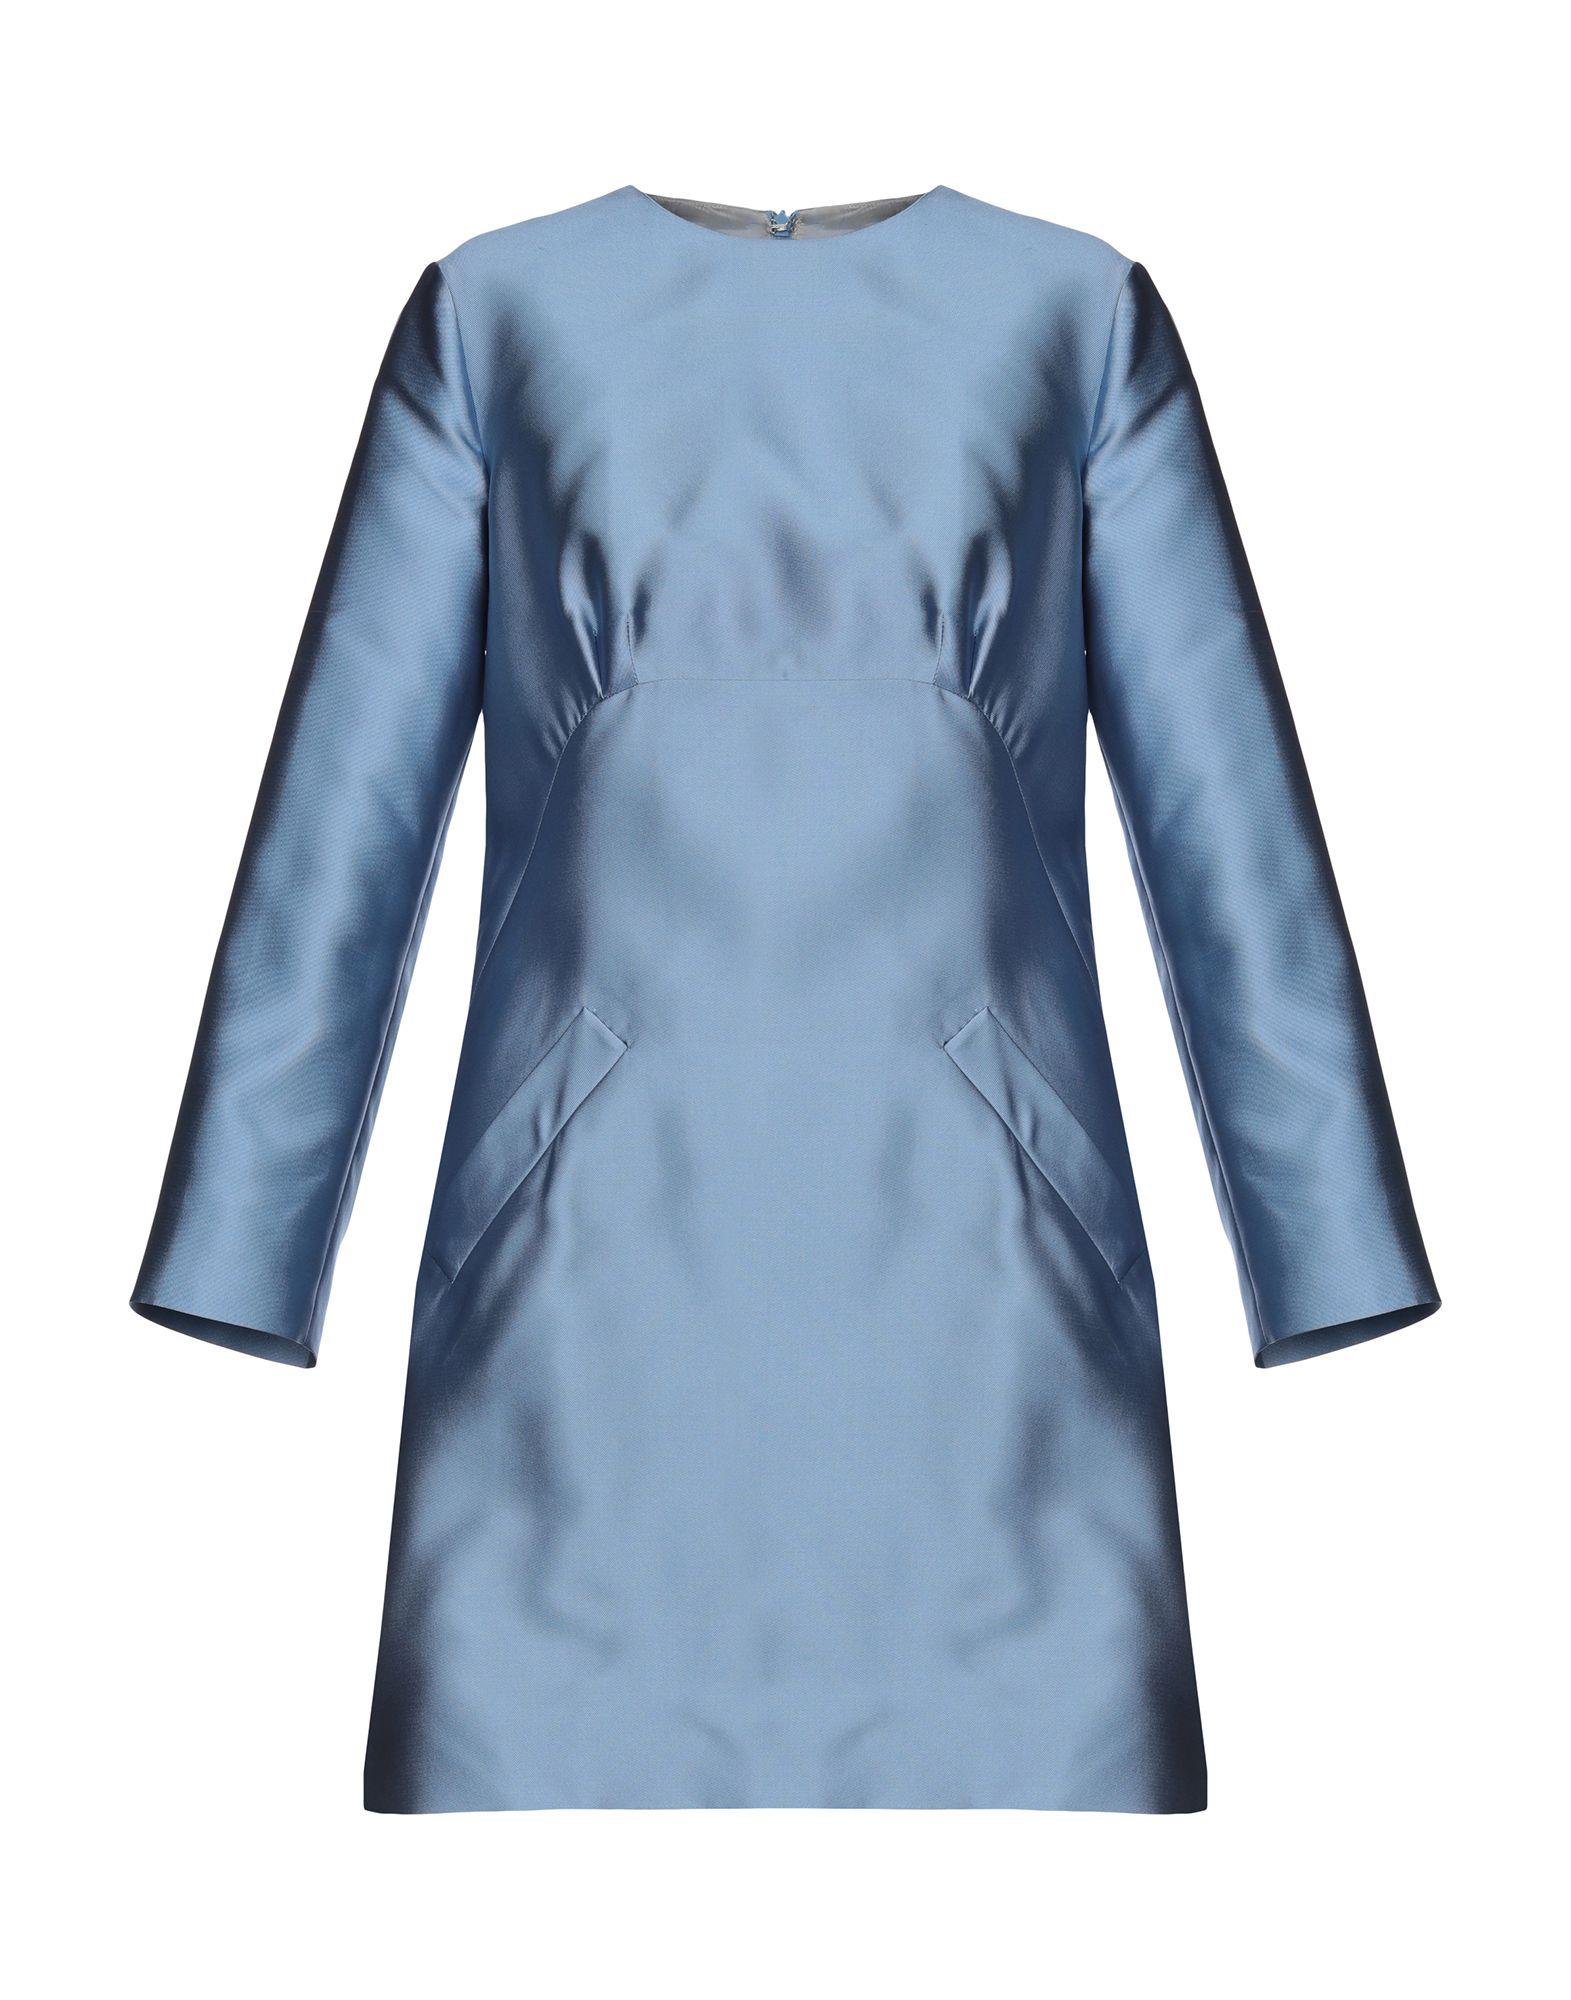 MERCHANT ARCHIVE Short Dresses in Sky Blue